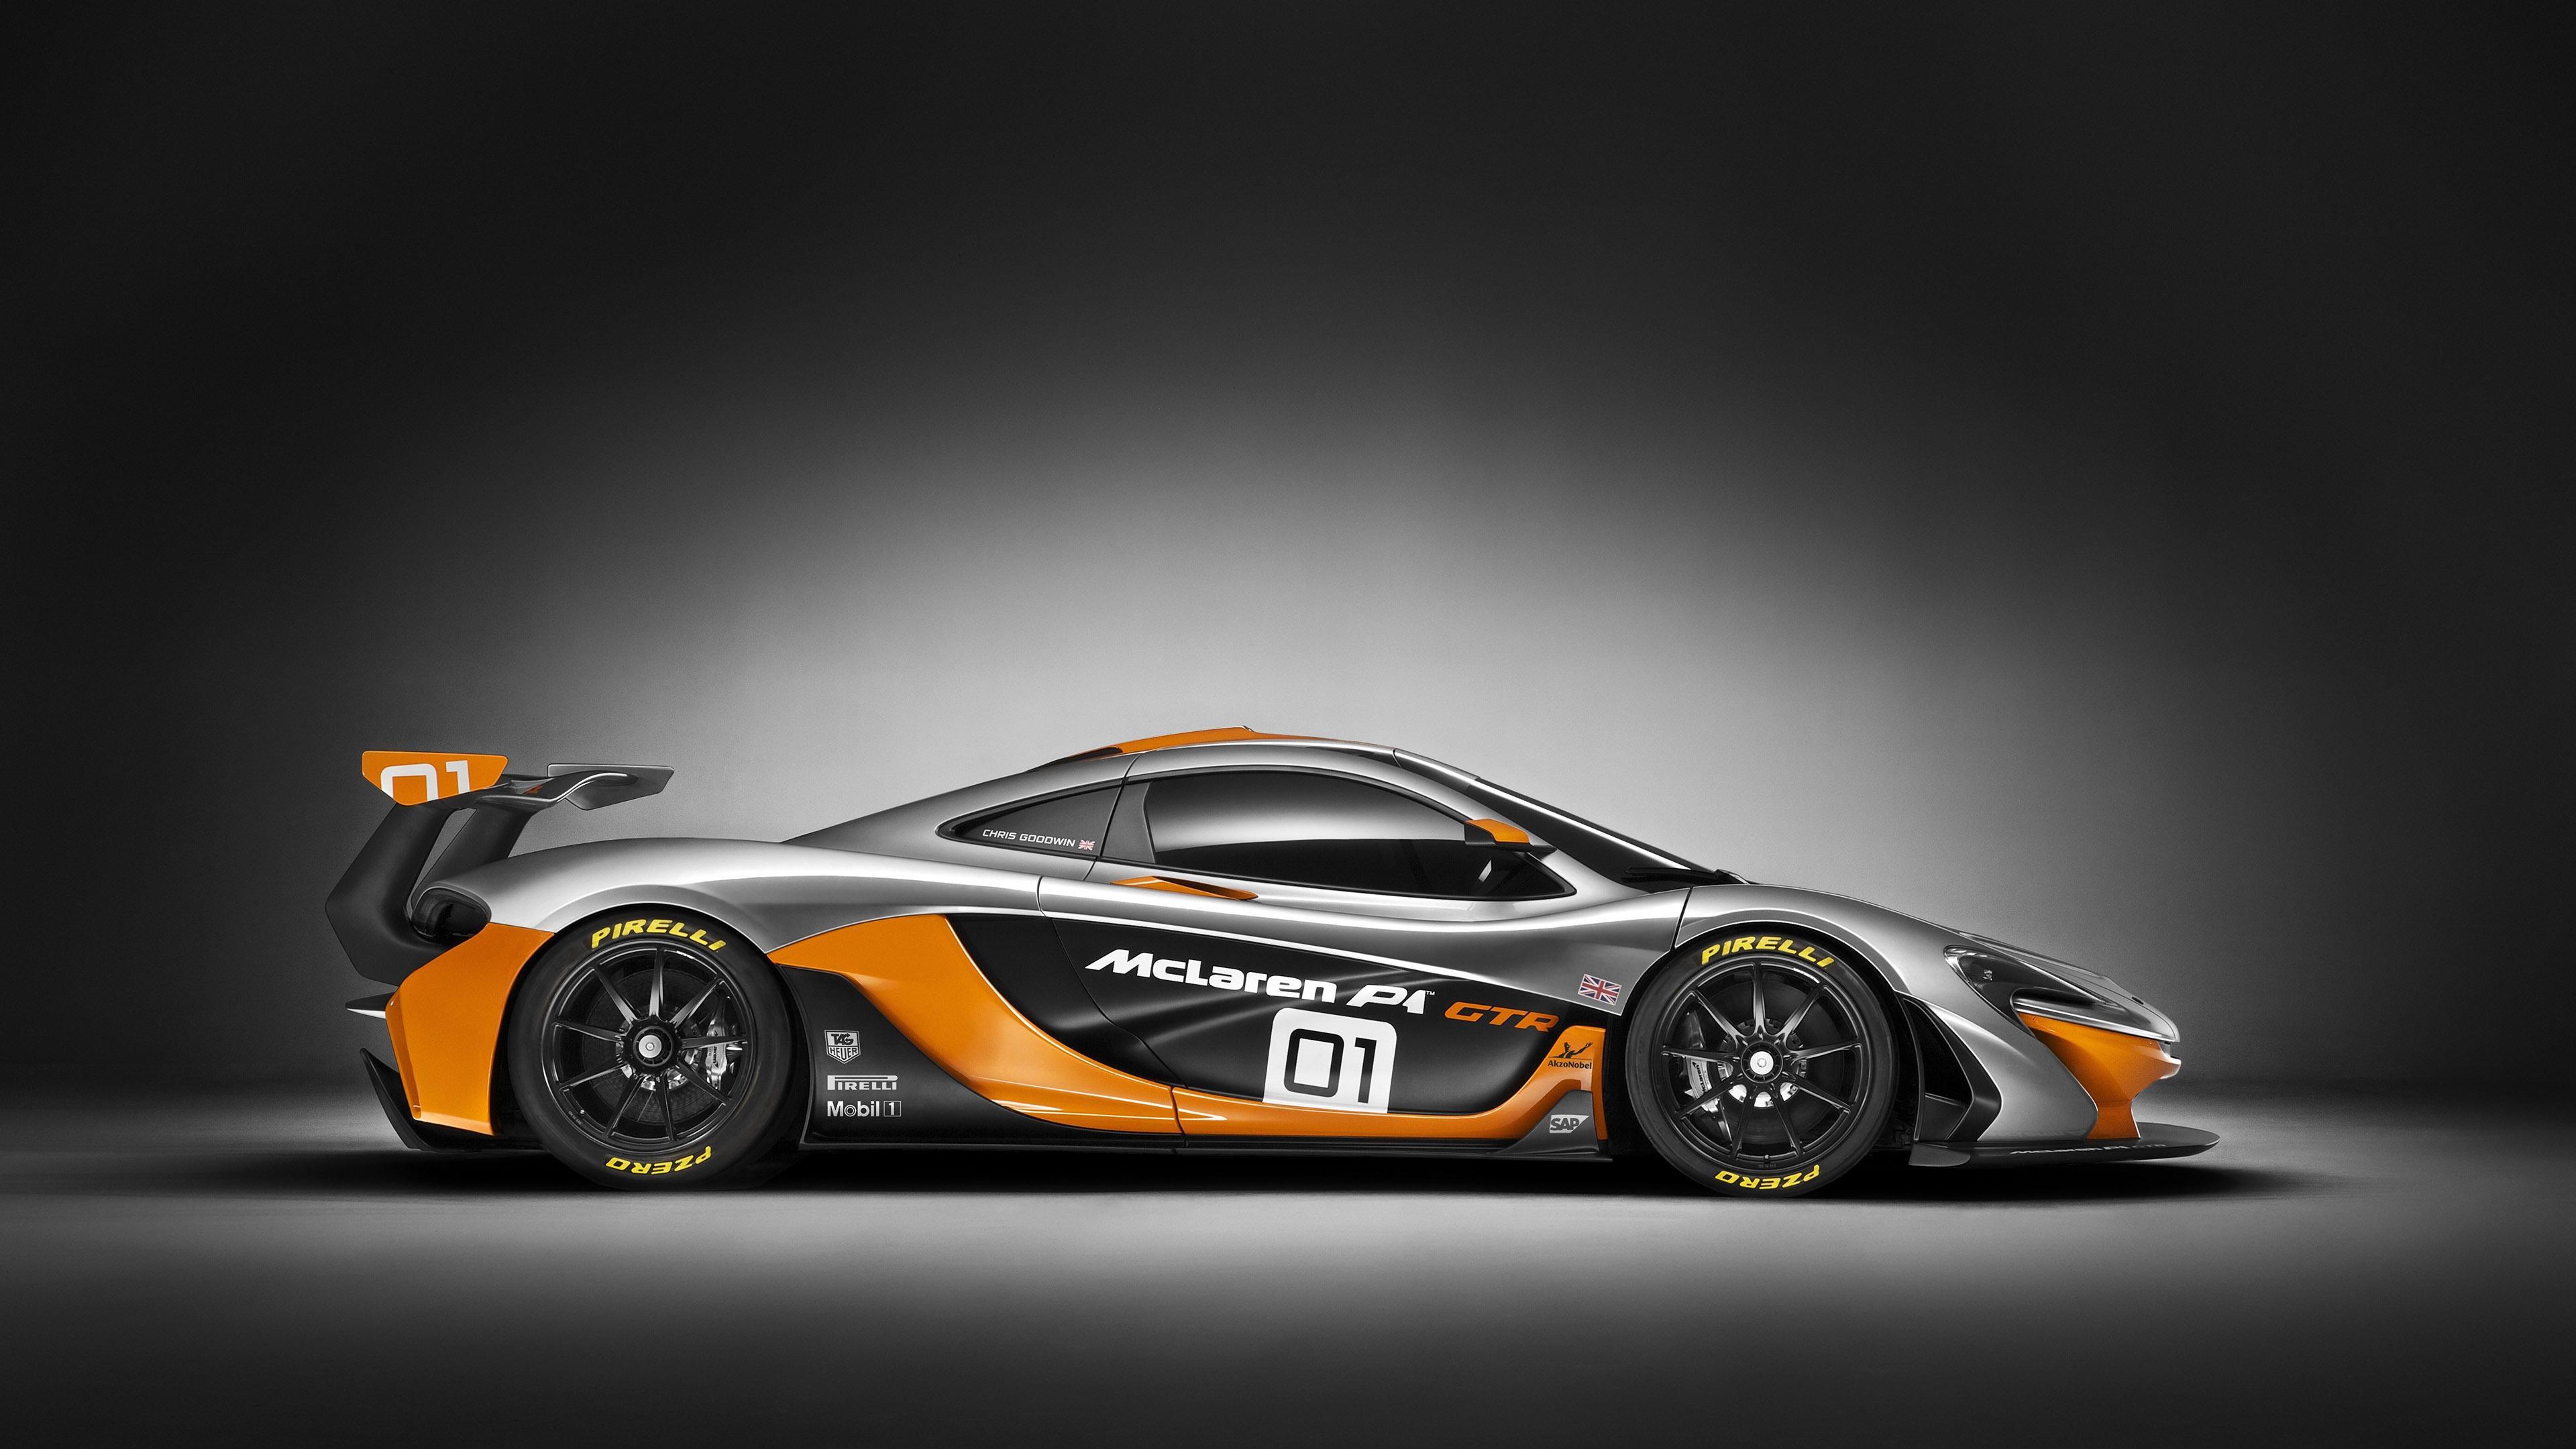 HD McLaren P1 race car side view Wallpaper Download   148966 3840x2160